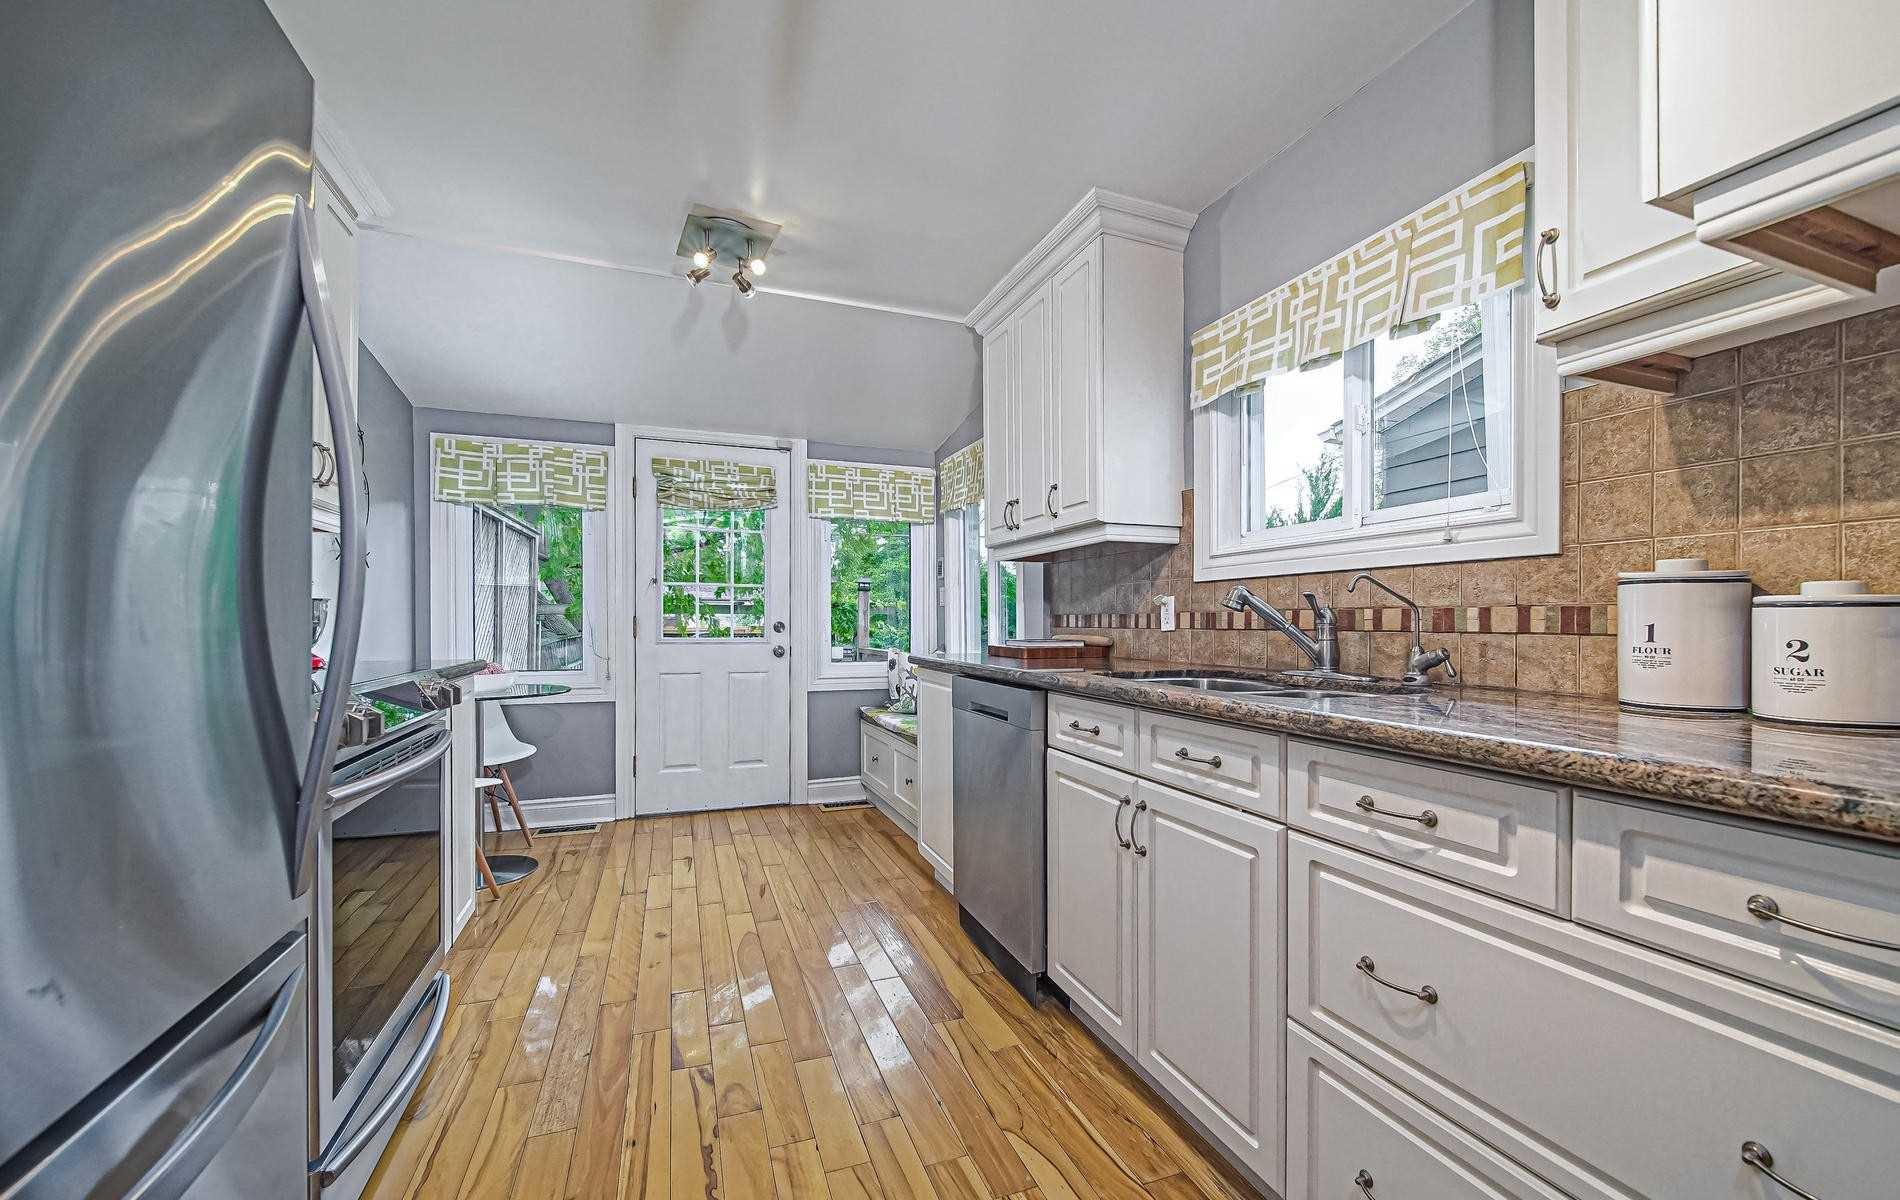 Photo 5: Photos: 84 Rushbrooke Avenue in Toronto: South Riverdale House (2-Storey) for sale (Toronto E01)  : MLS®# E4600791